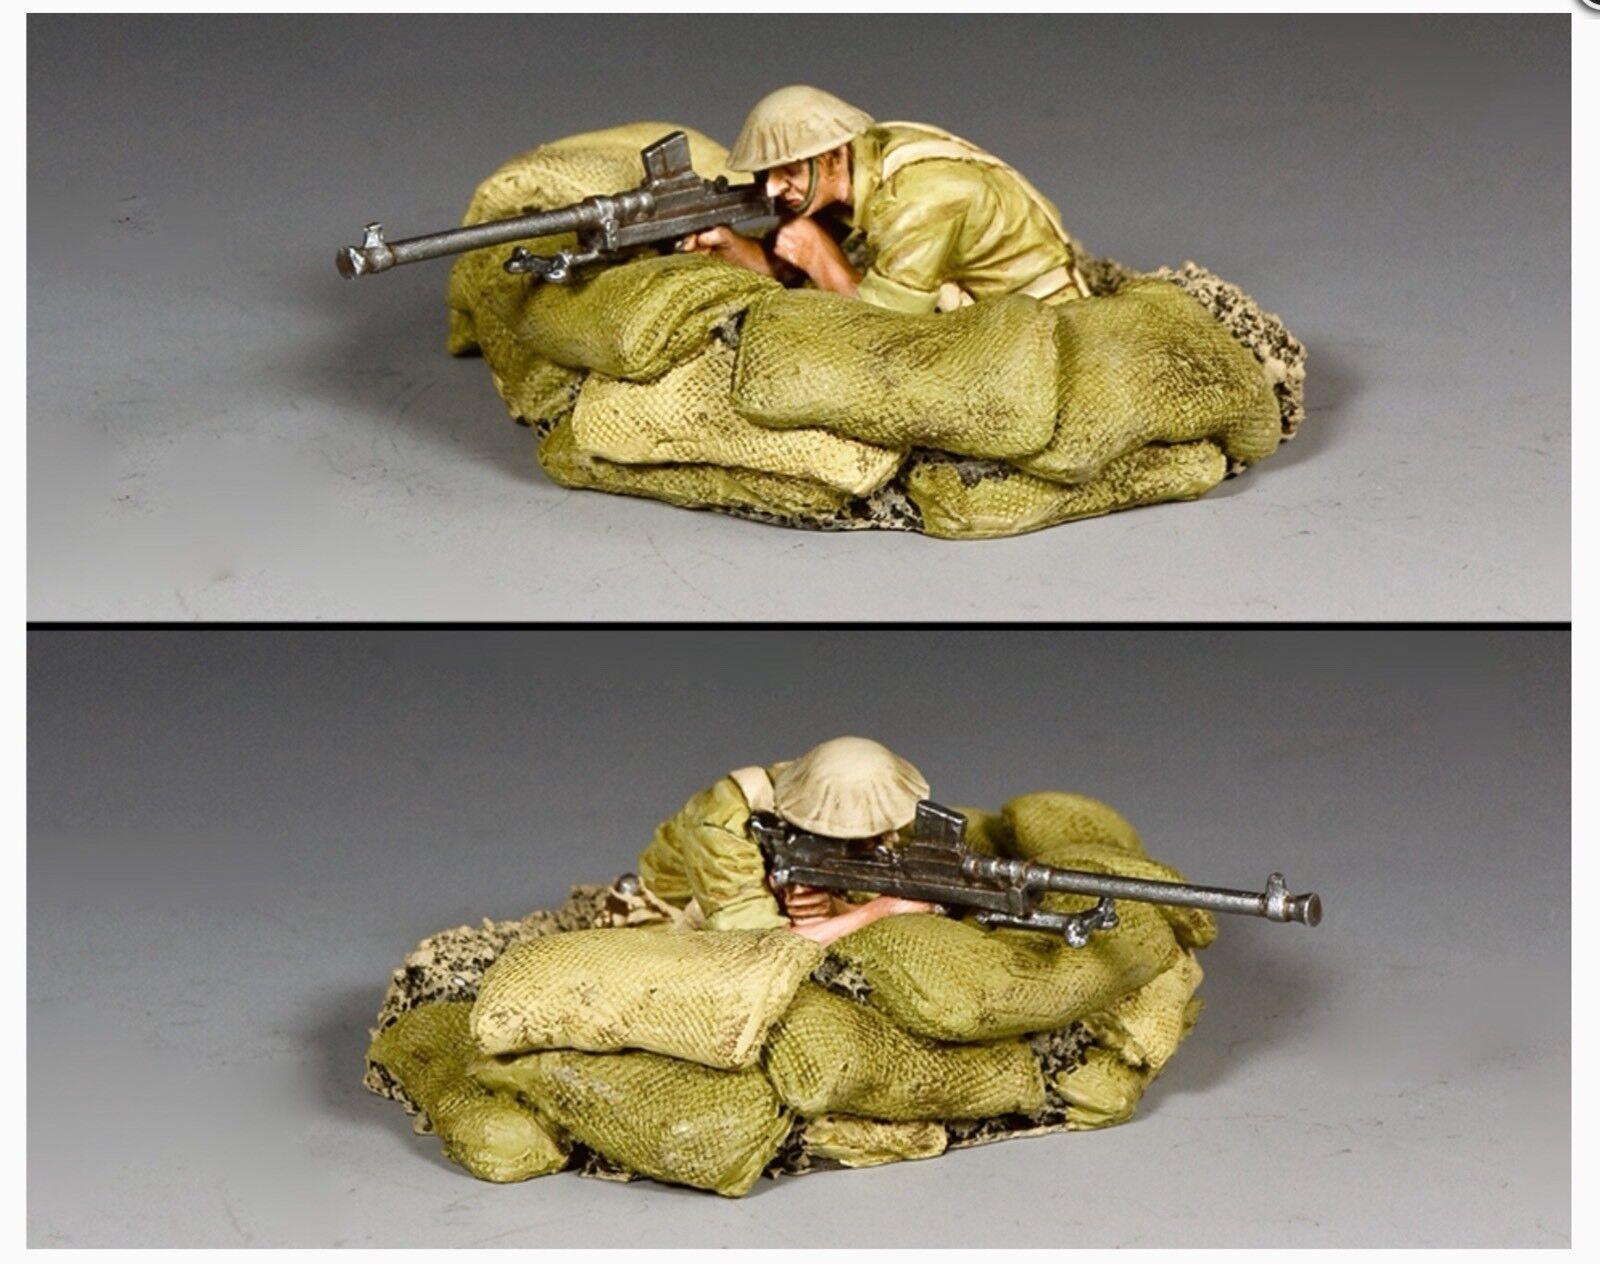 EA126 WW2 British Desert Rats Trench Trench & 'Boys' Anti Tank Gun Set New Mint EA 126